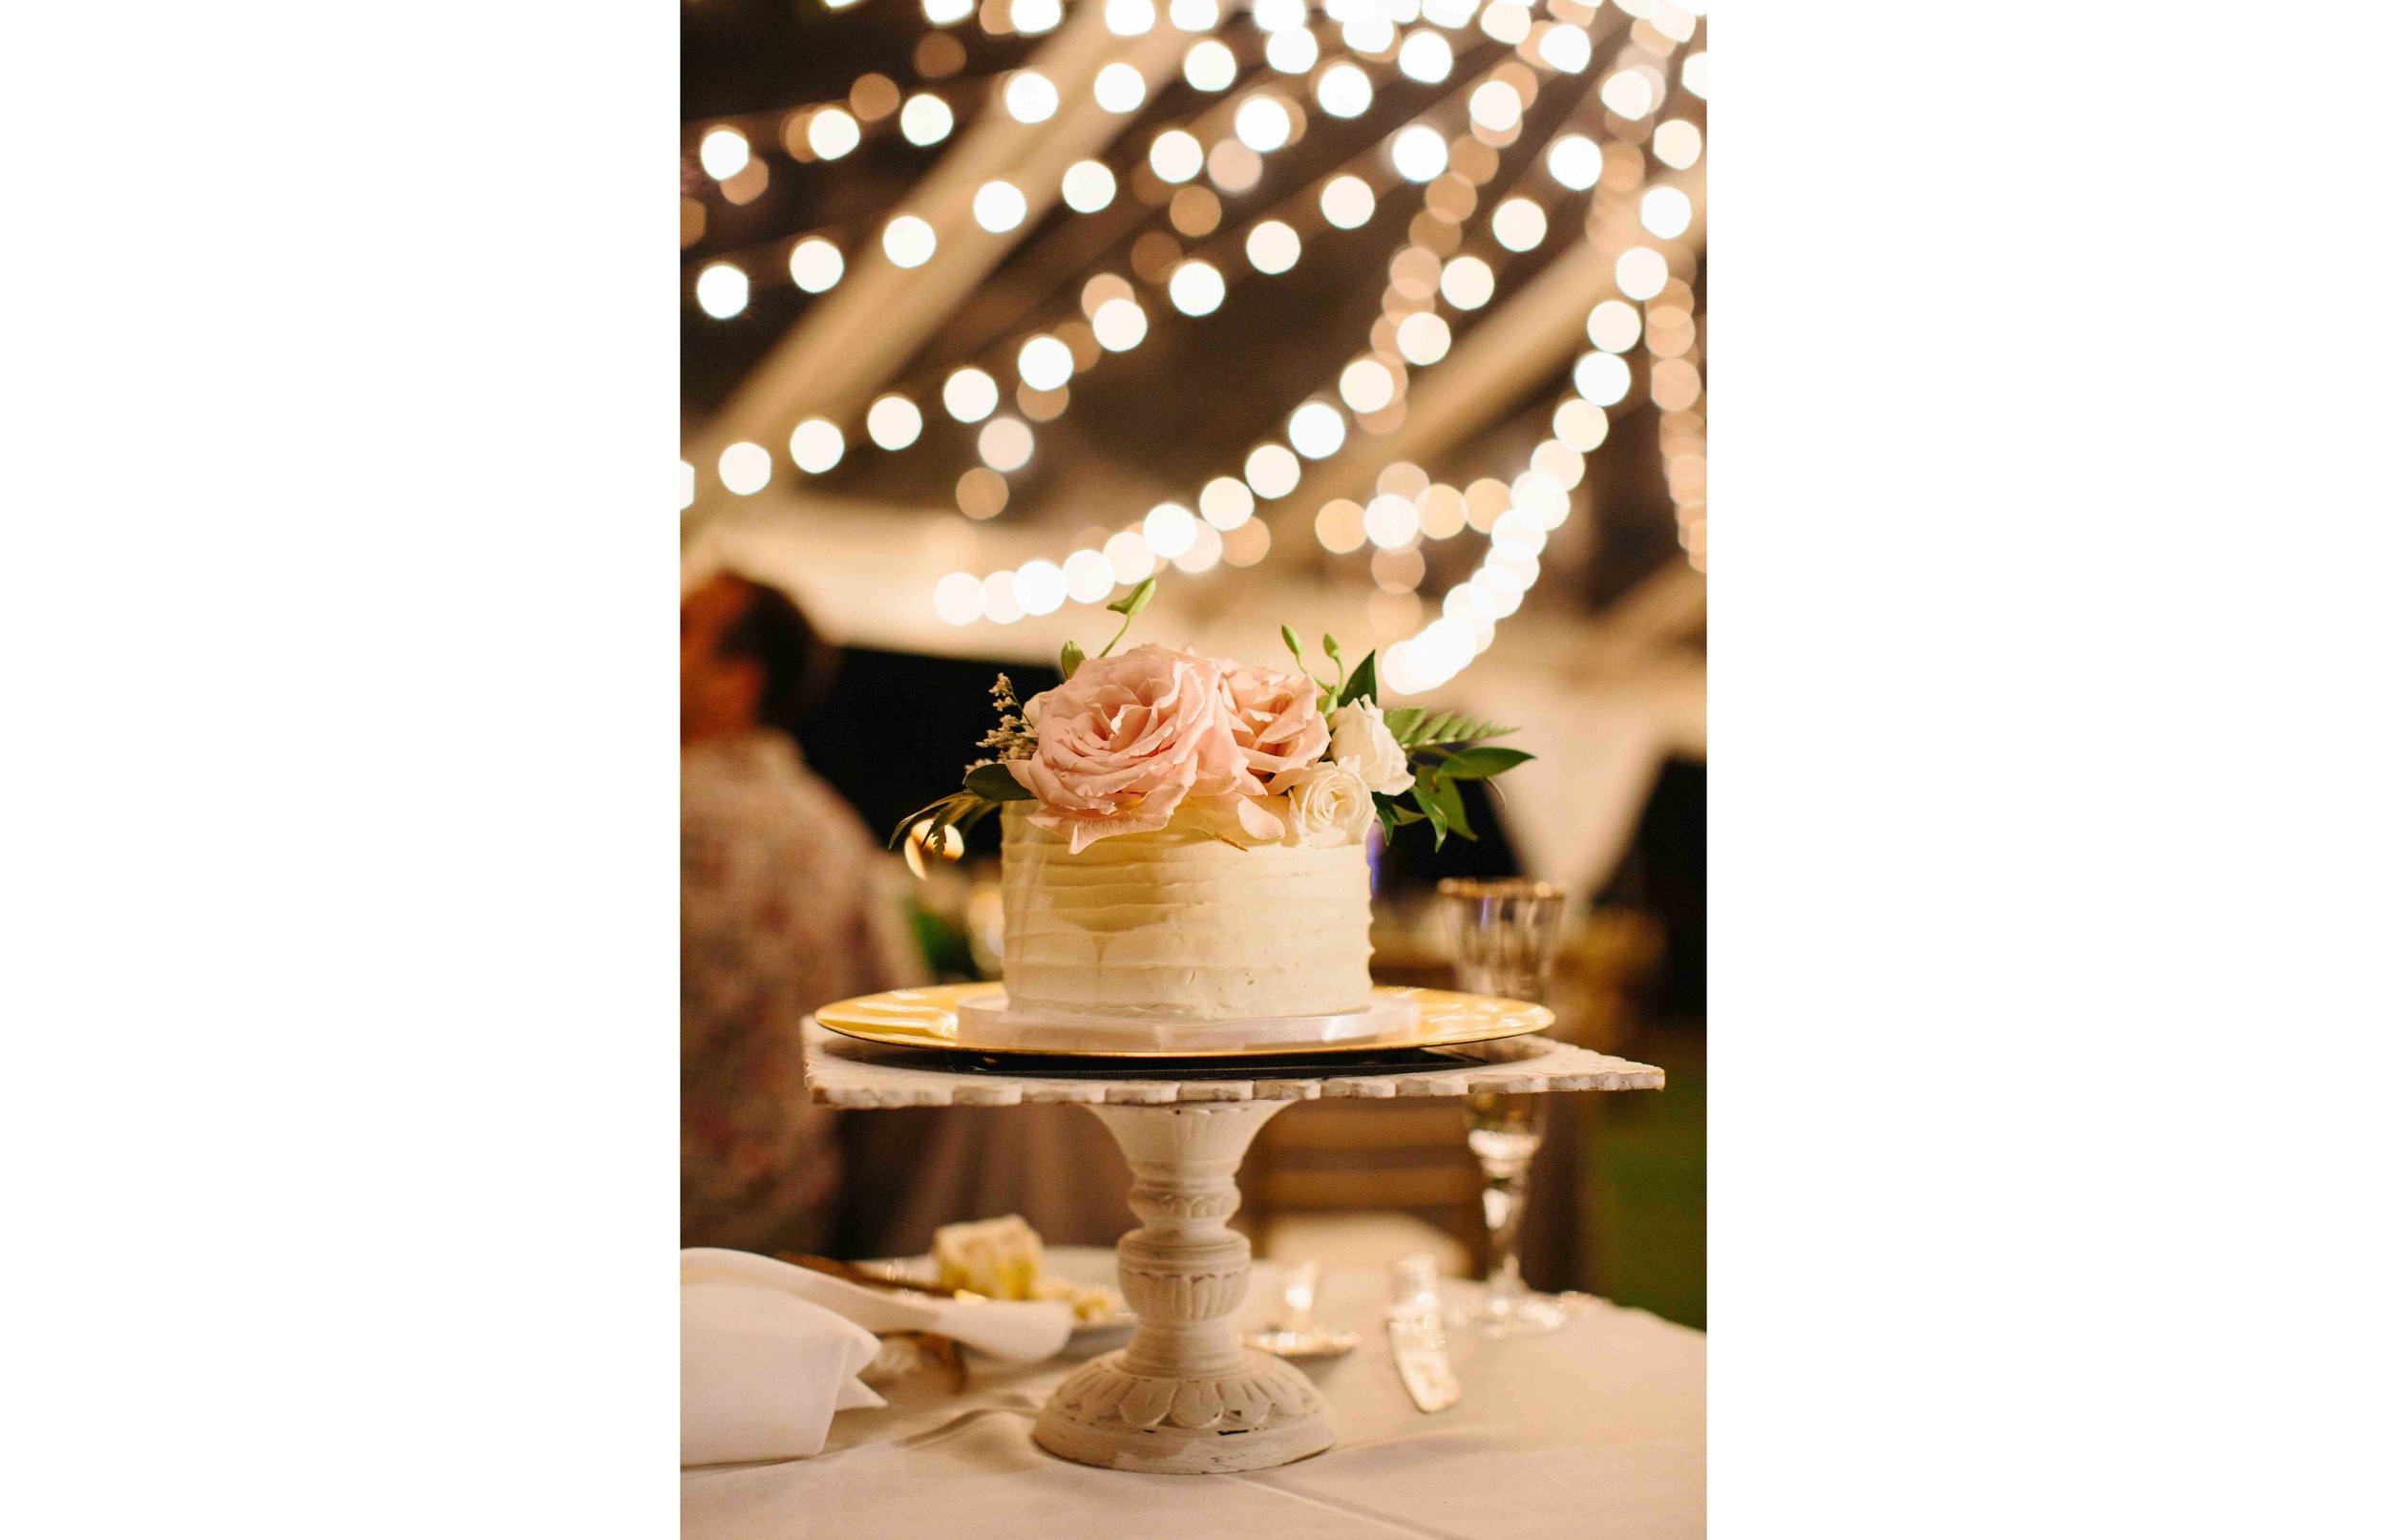 Miniature Wedding Cake at a Wedding Reception